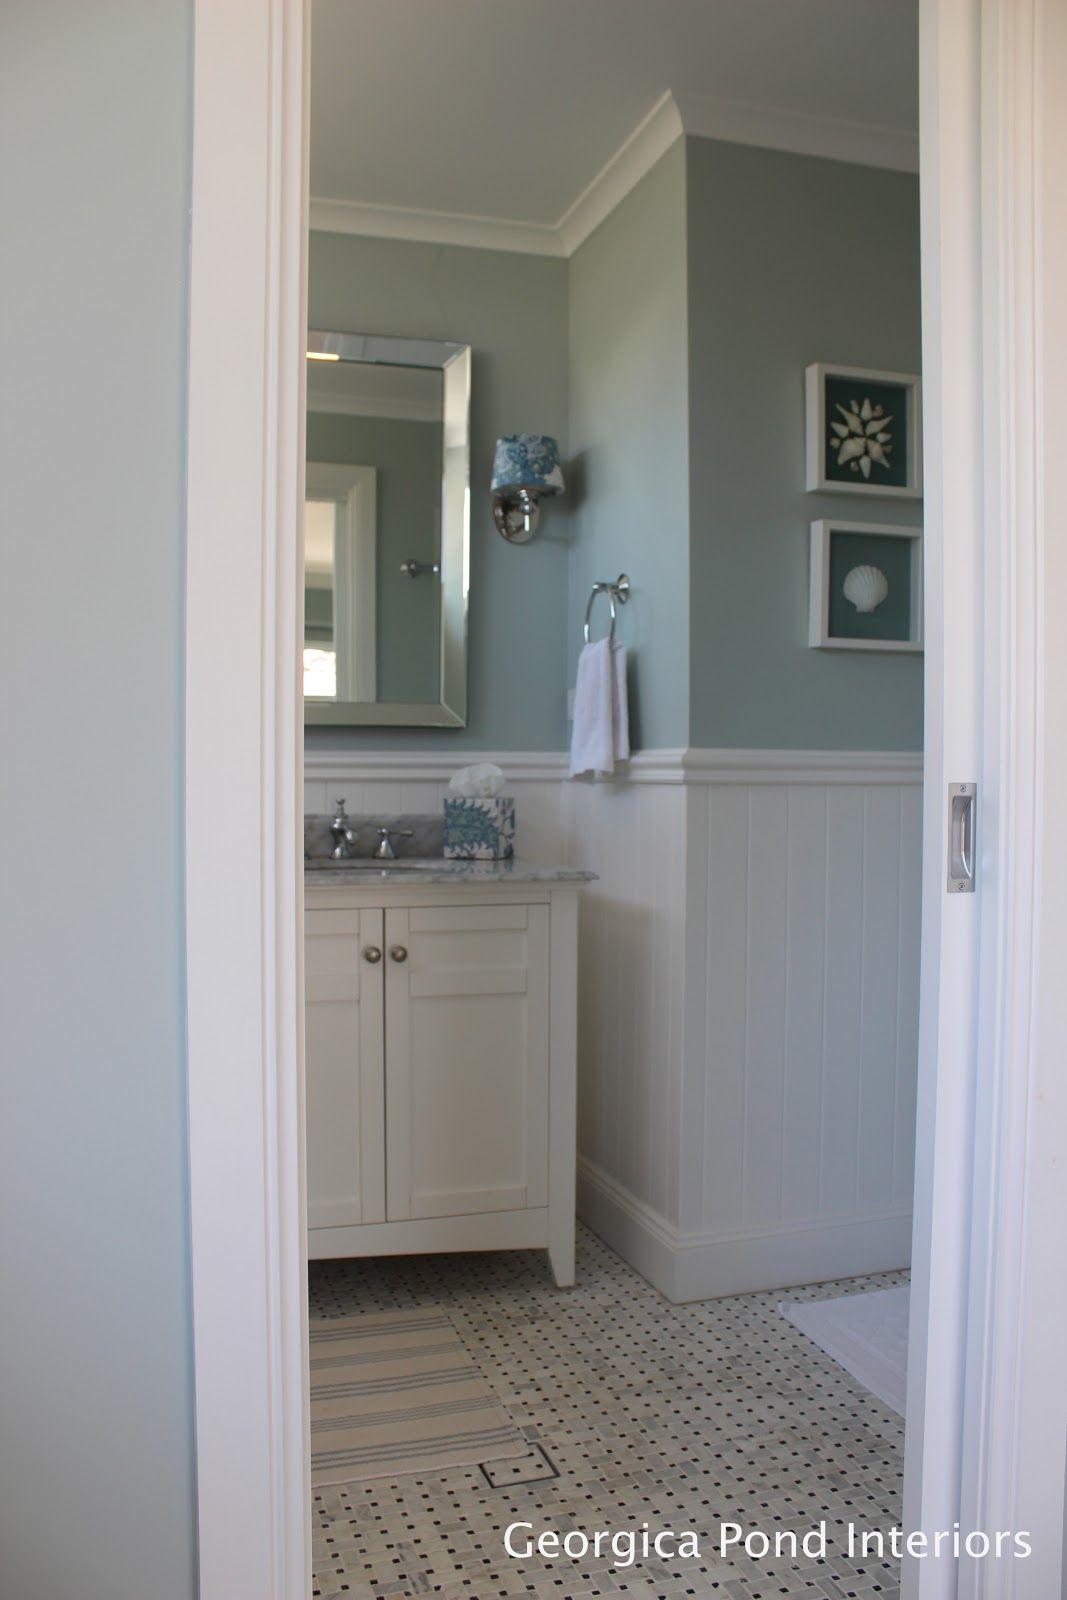 Georgica pond interiors vanity bathroom marble mirrors